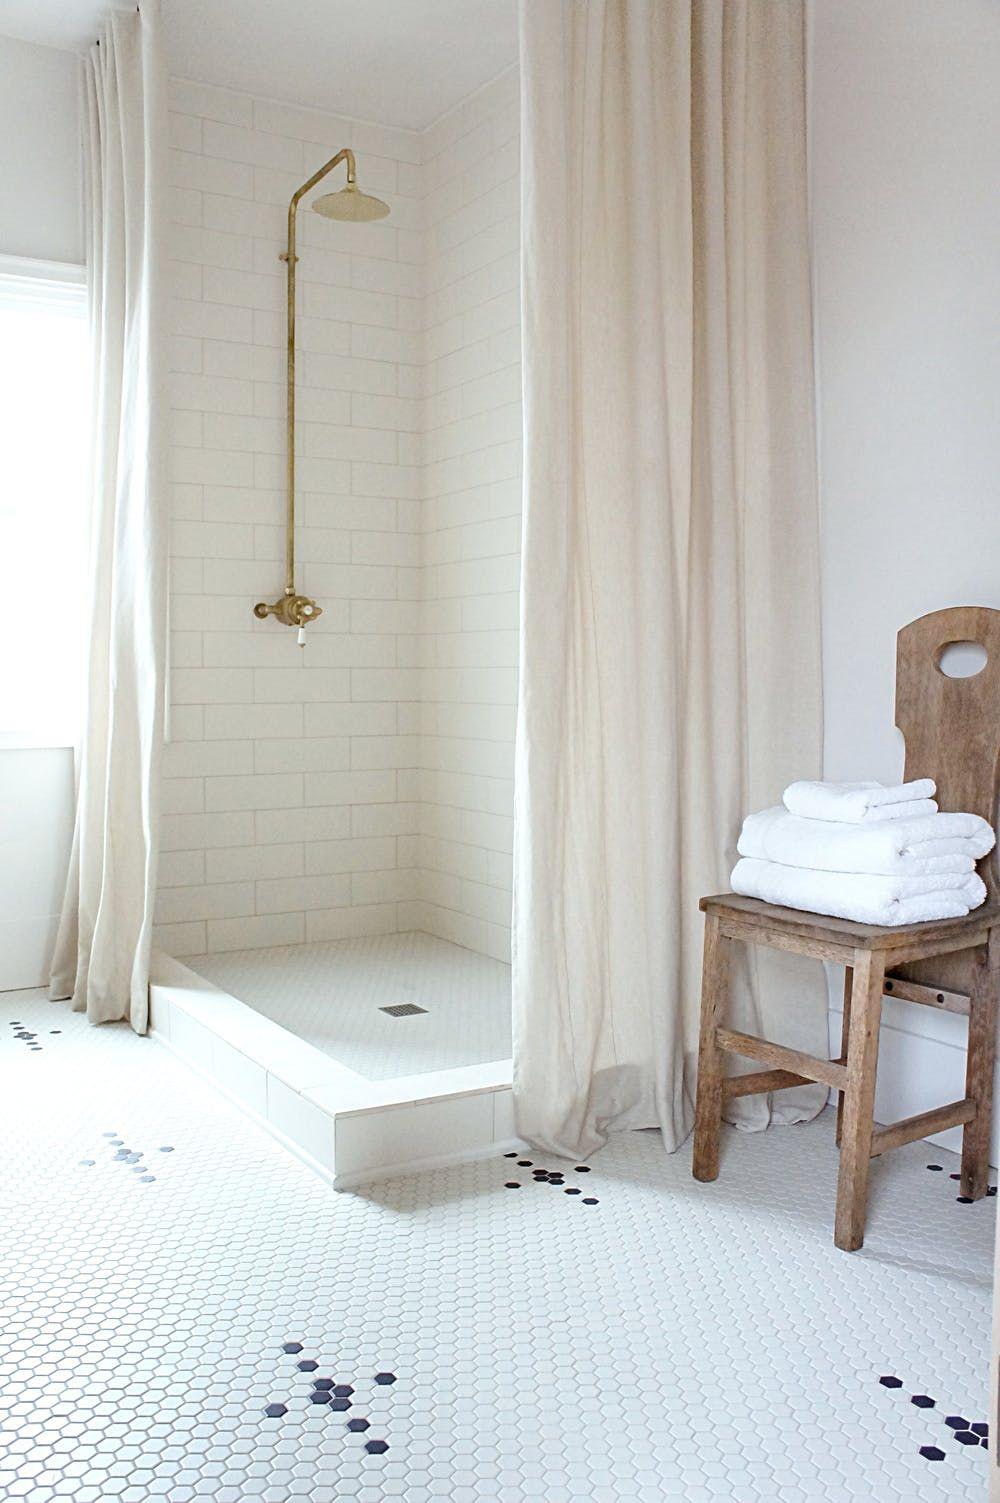 Mosaic Tile Floor Ideas for Vintage Style Bathrooms | Open baths ...